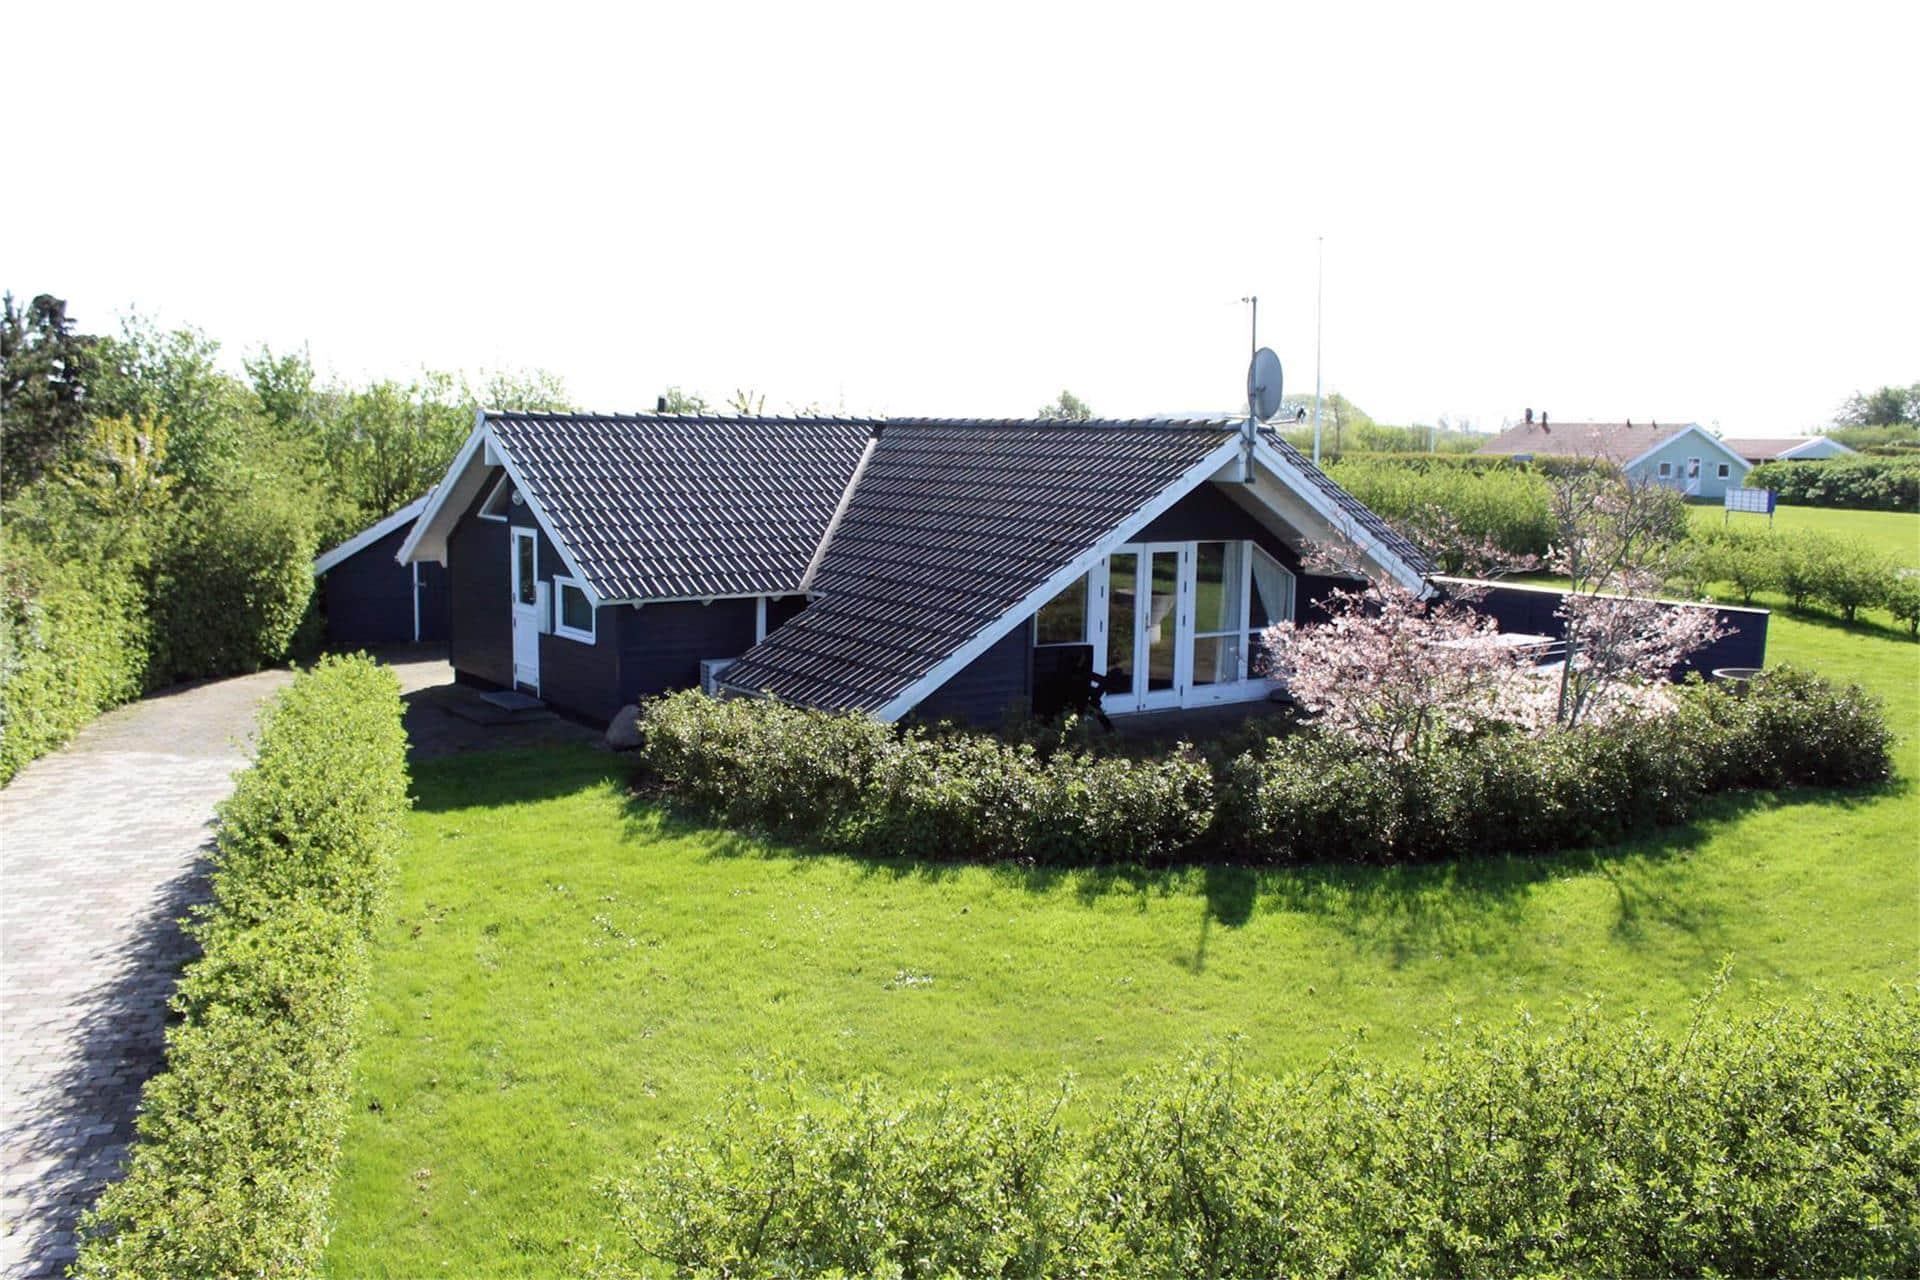 Image 1-3 Holiday-home M65076, Mellembakken 11, DK - 5610 Assens